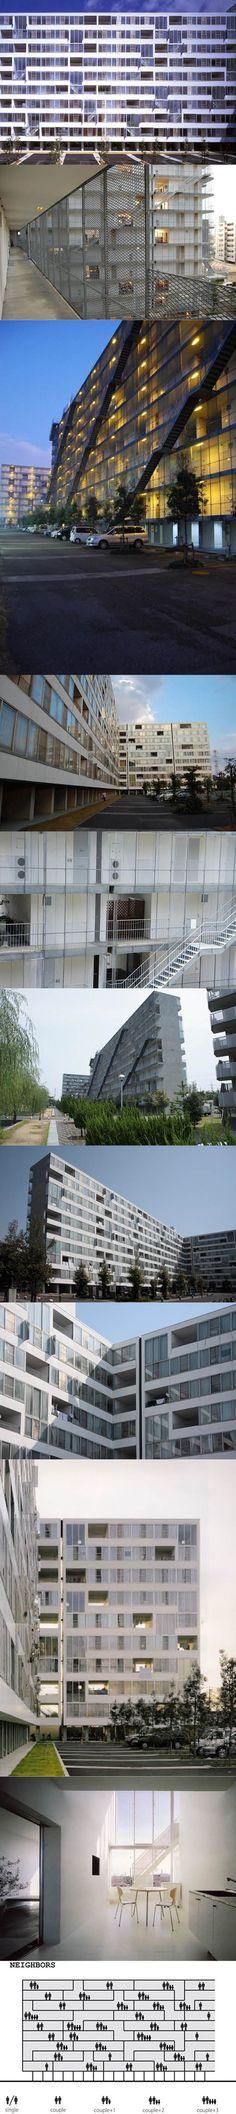 1994-2000 Sejima - Gifu Kitagata Apartments / white / steel concrete / minimalism / Japan / Sanaa / Kazuyo Sejima / social housing